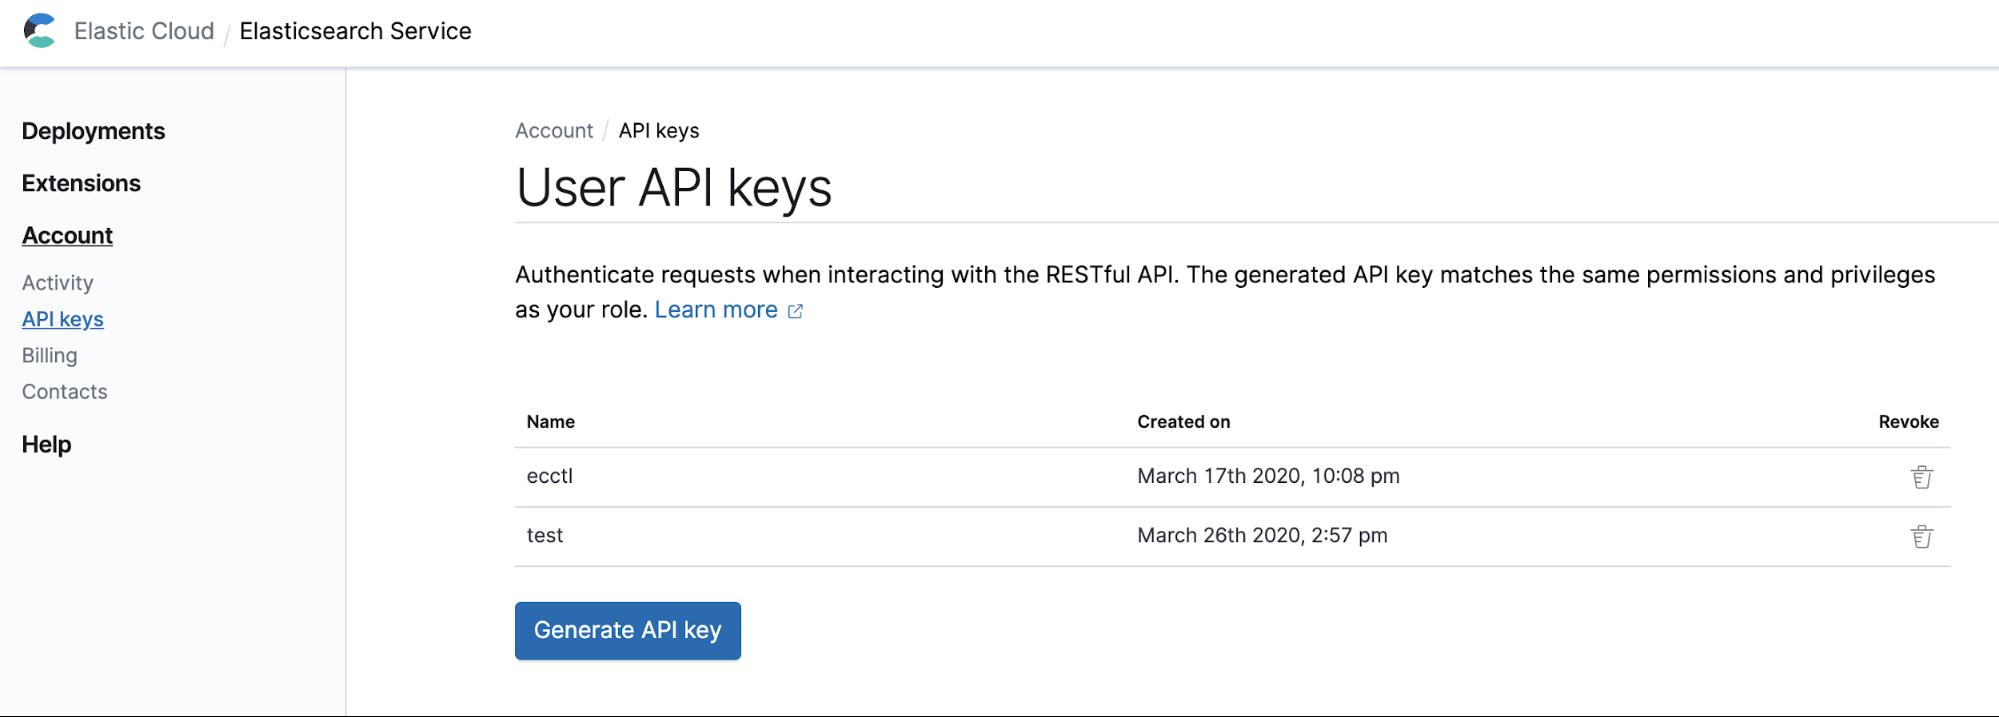 Create a API key from the Elastic Cloud console